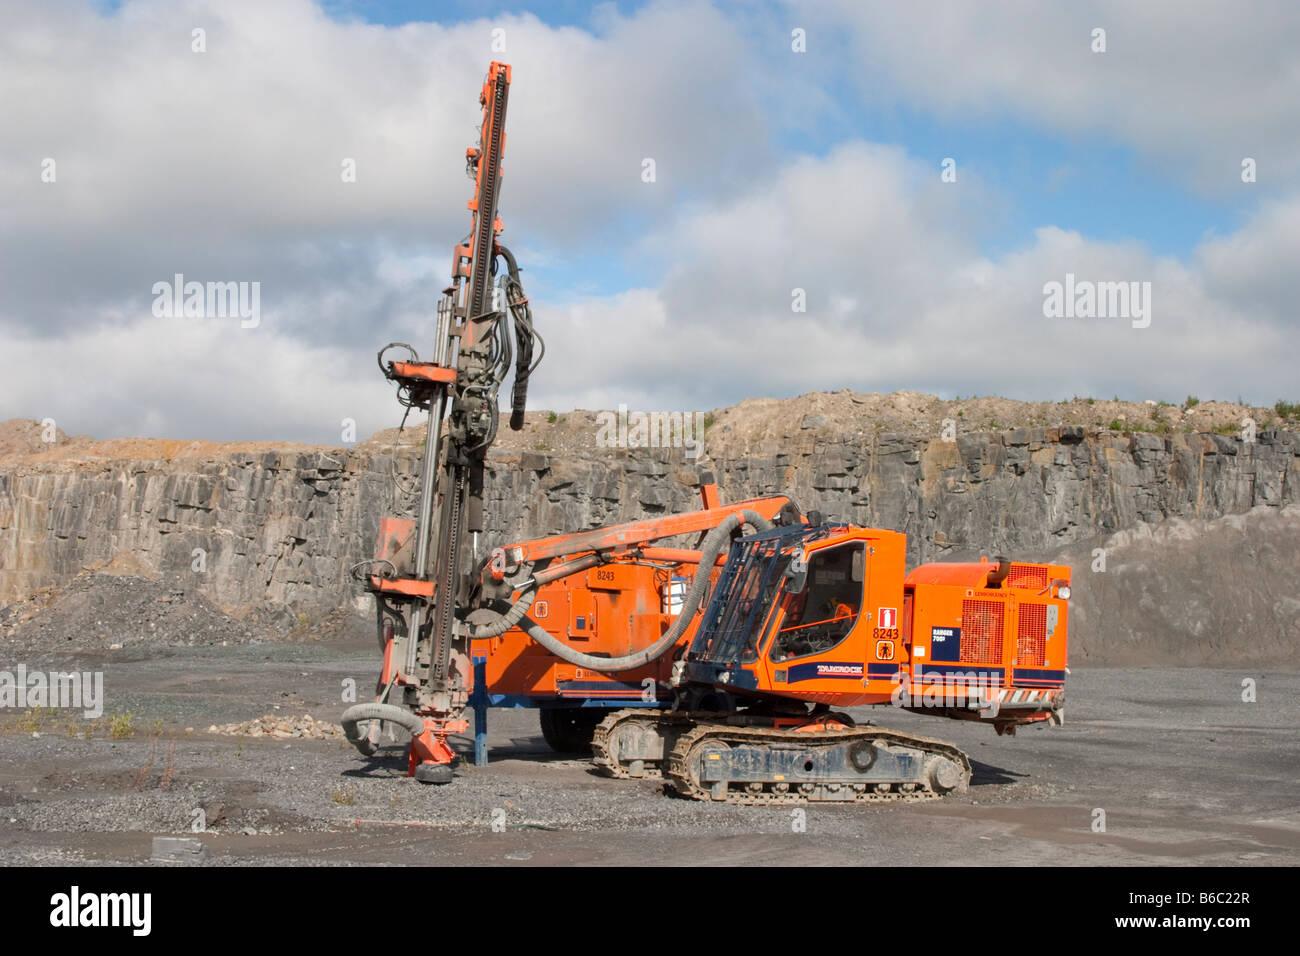 Tamrock Ranger 780 rock drilling machine at a rock quarry